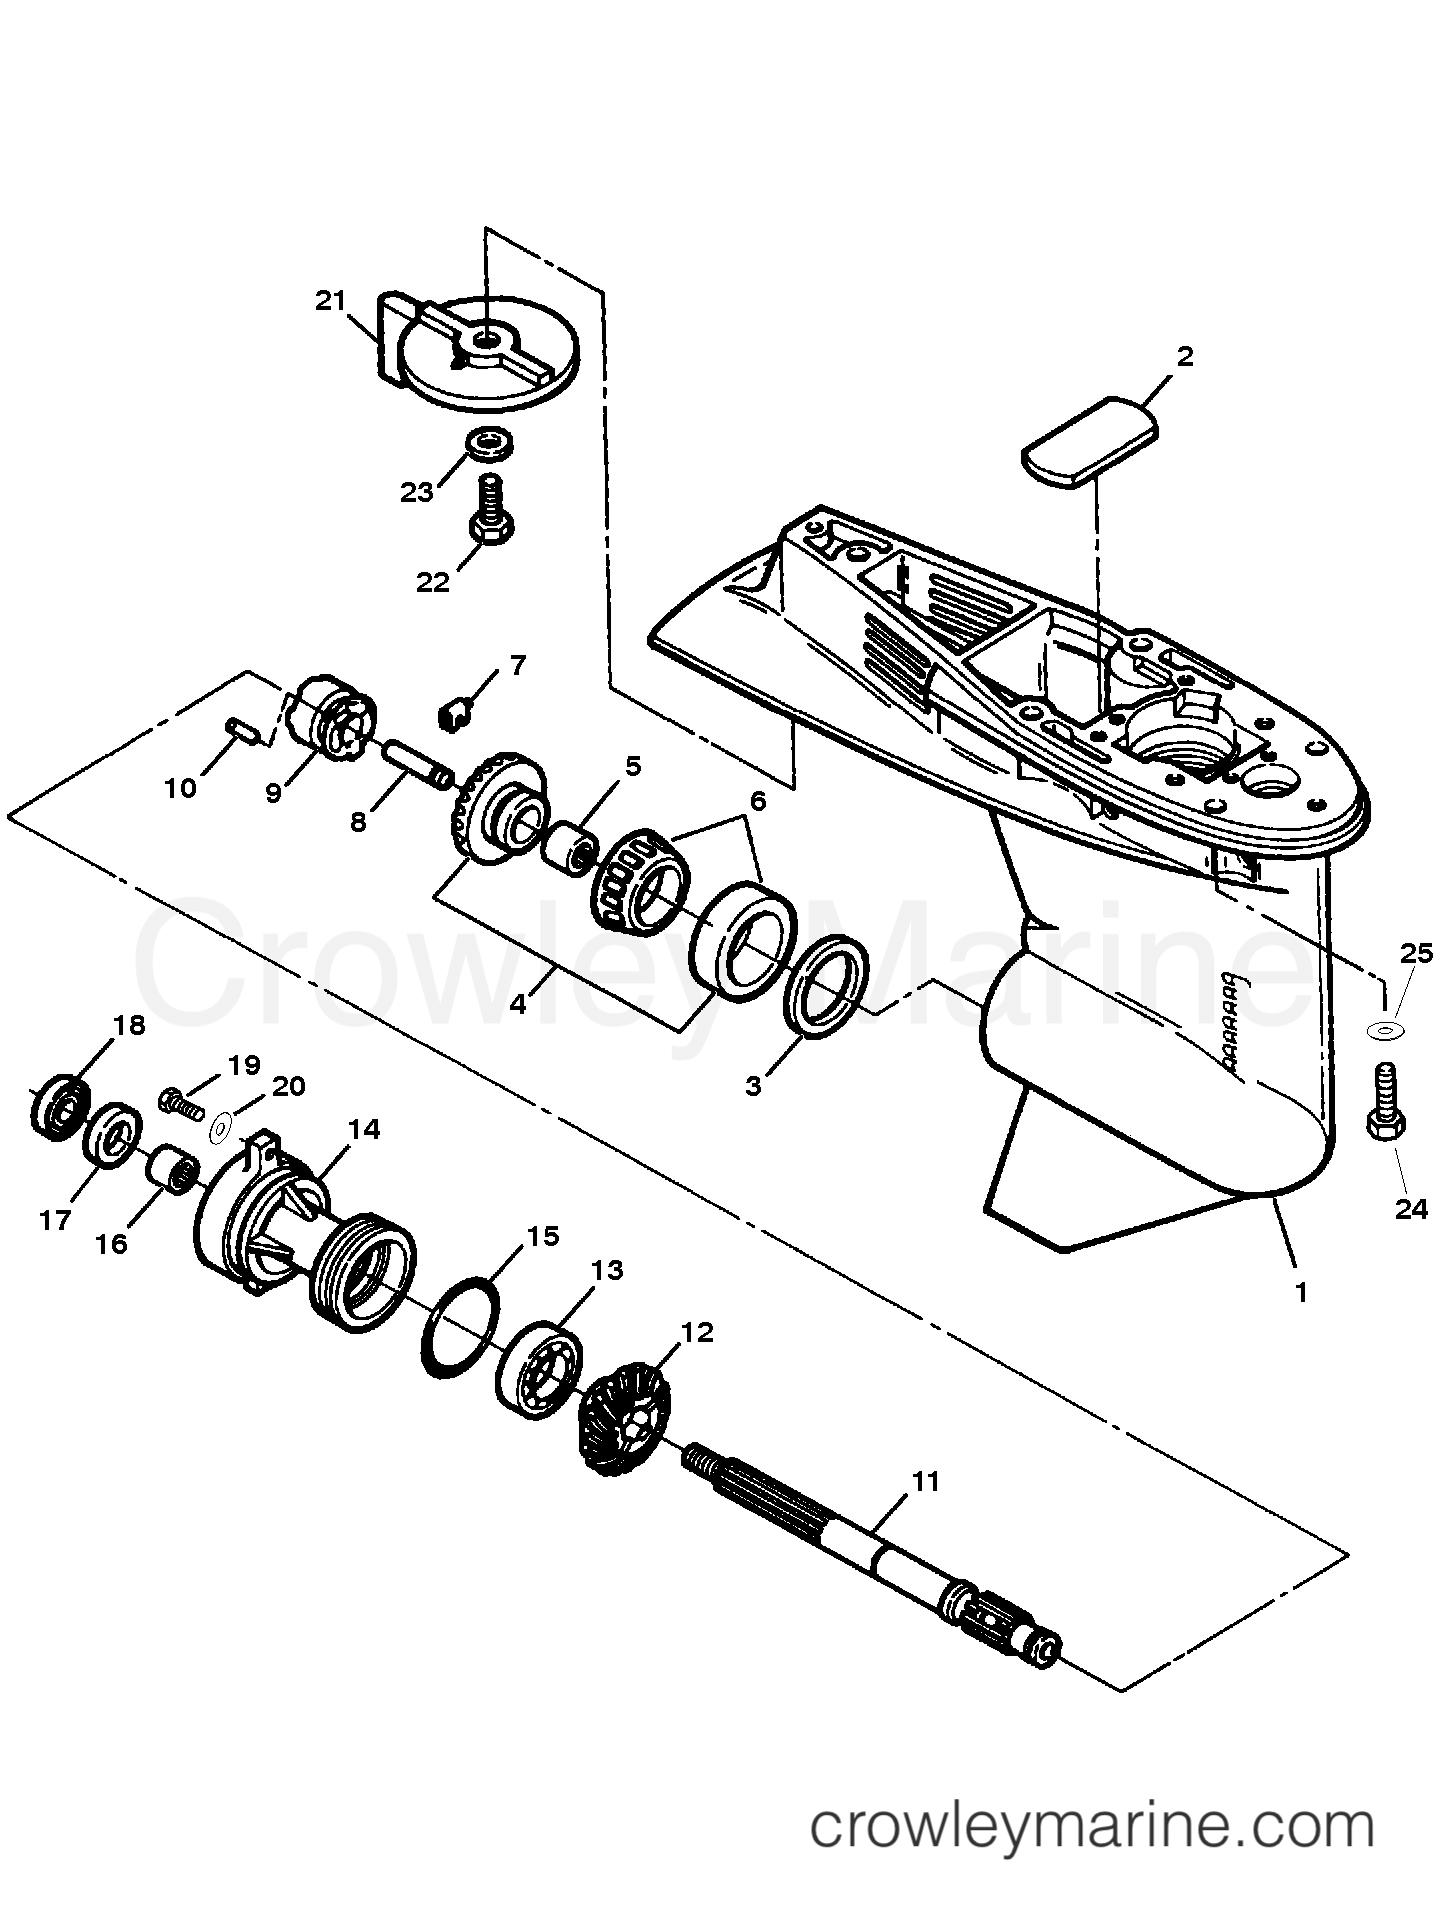 gear housing assembly